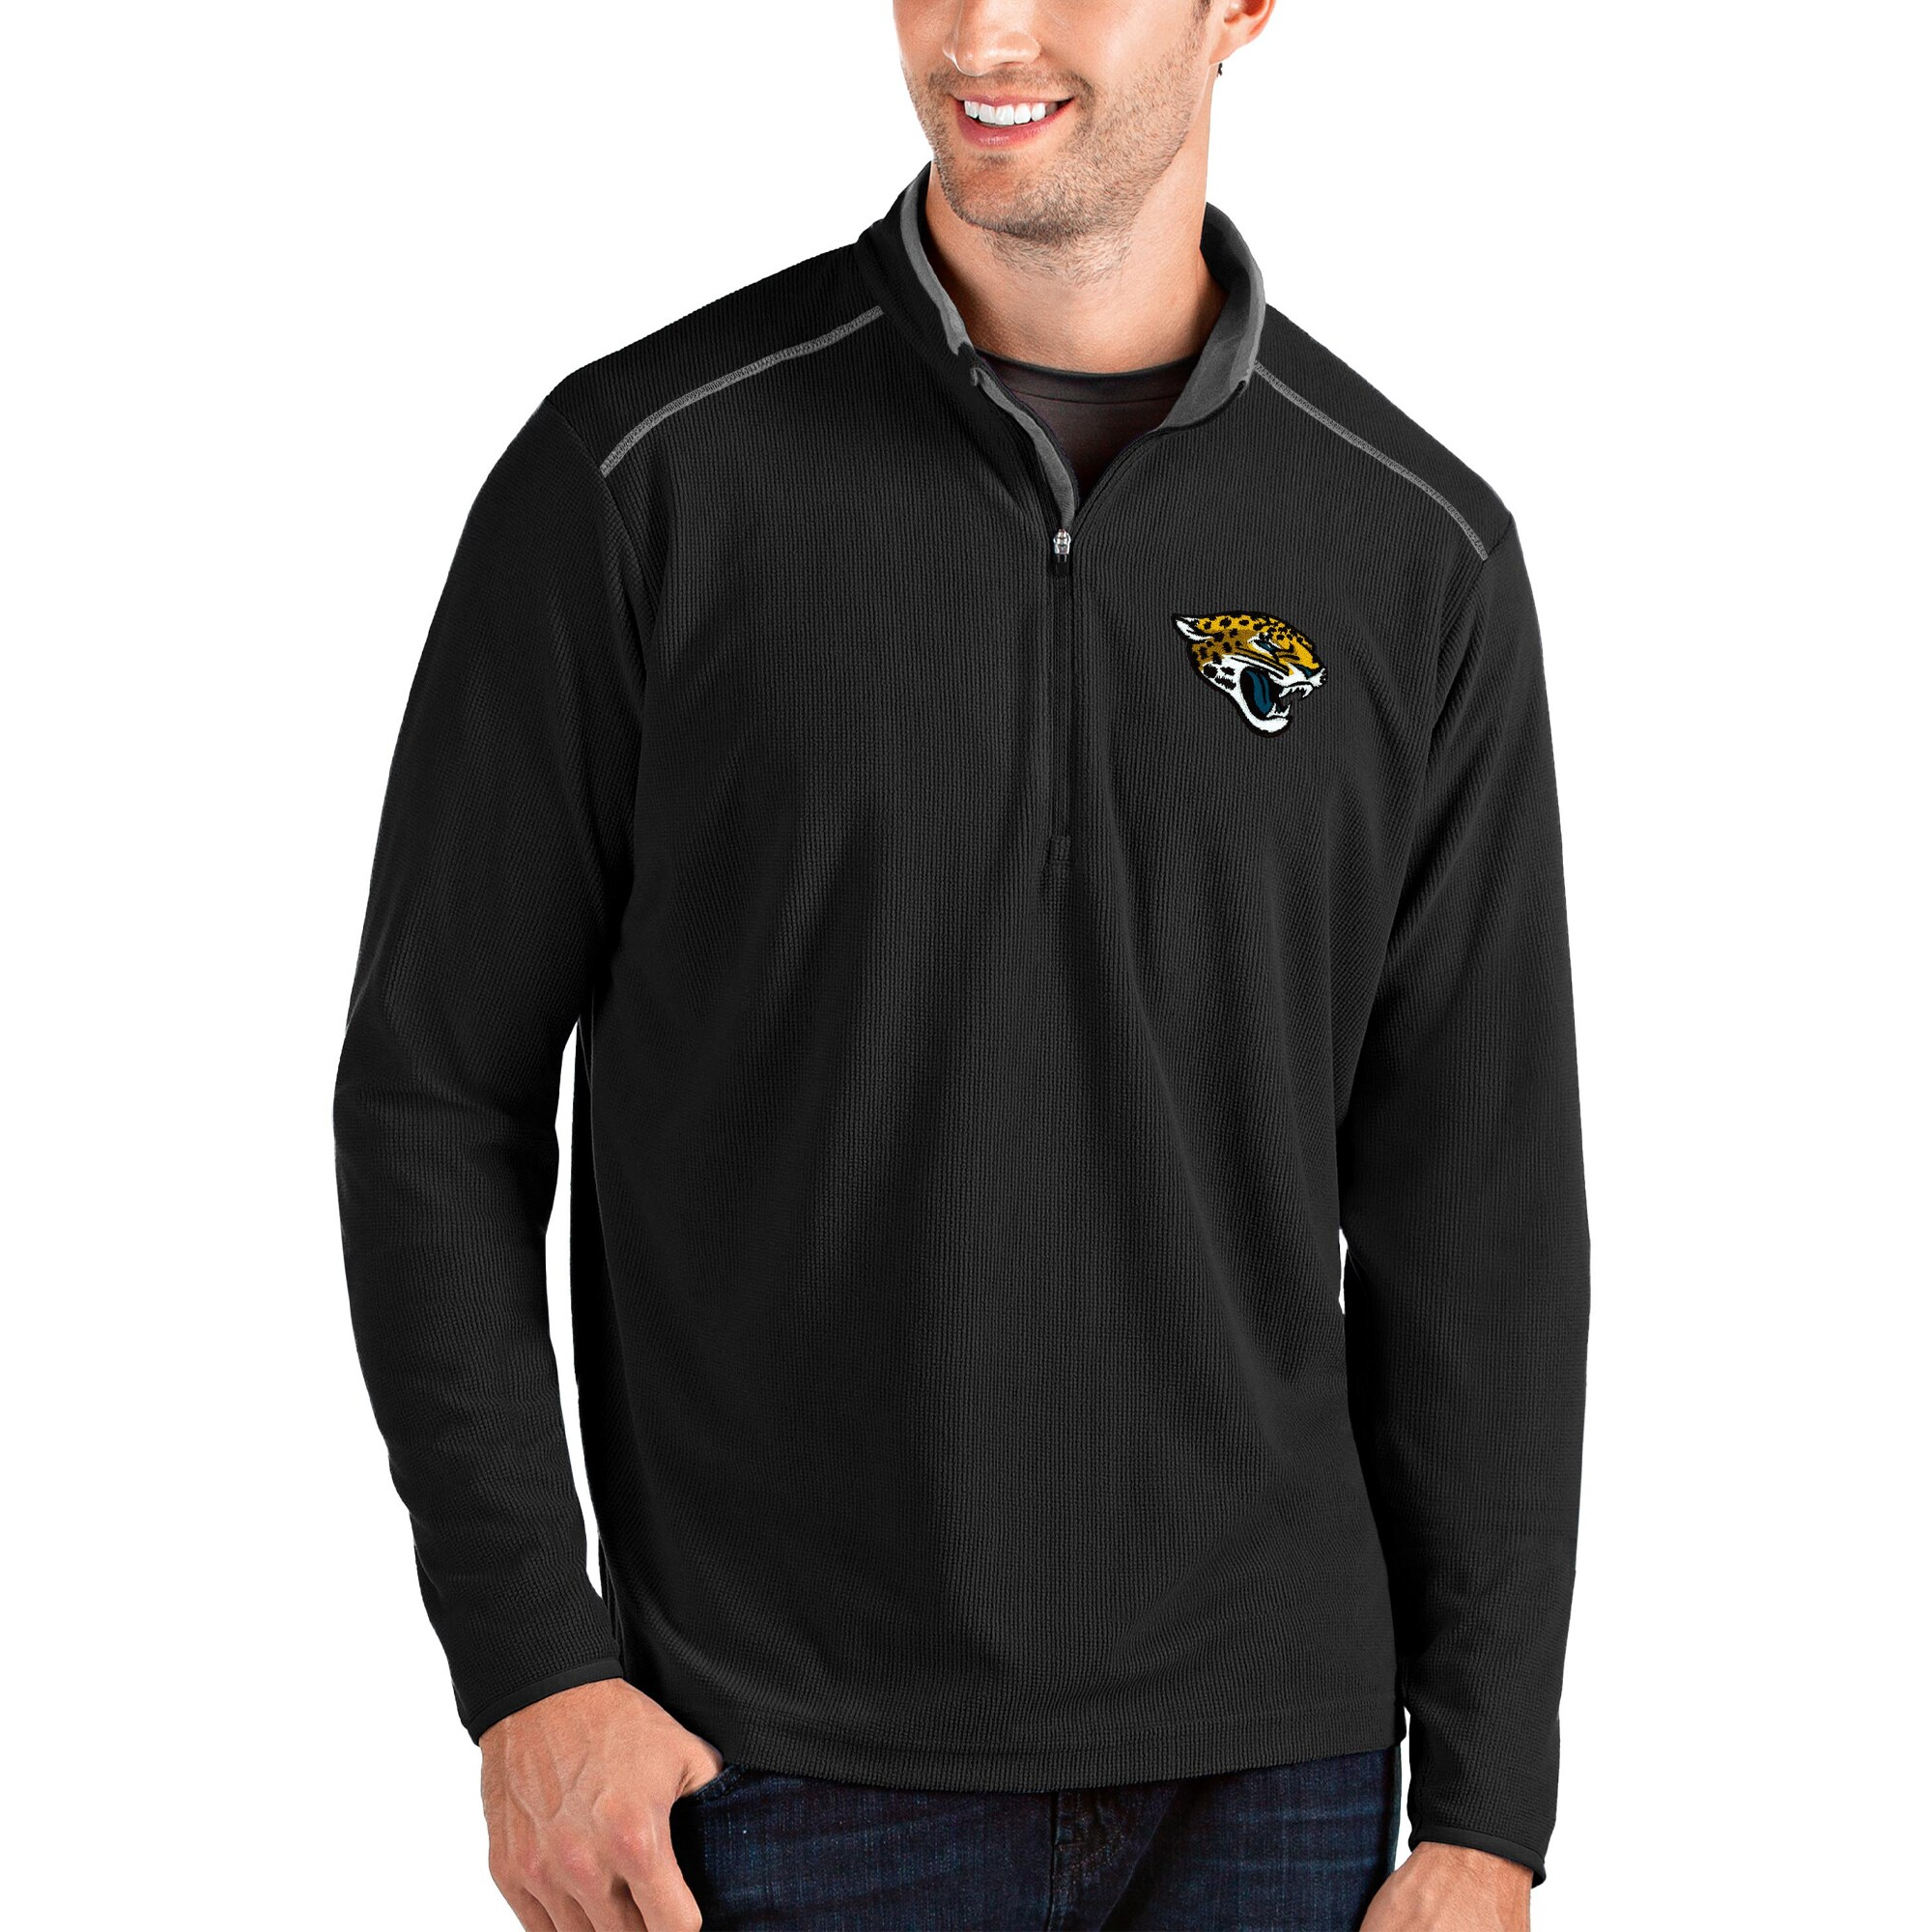 Jacksonville Jaguars Antigua Glacier Quarter-Zip Pullover Jacket - Black/Gray